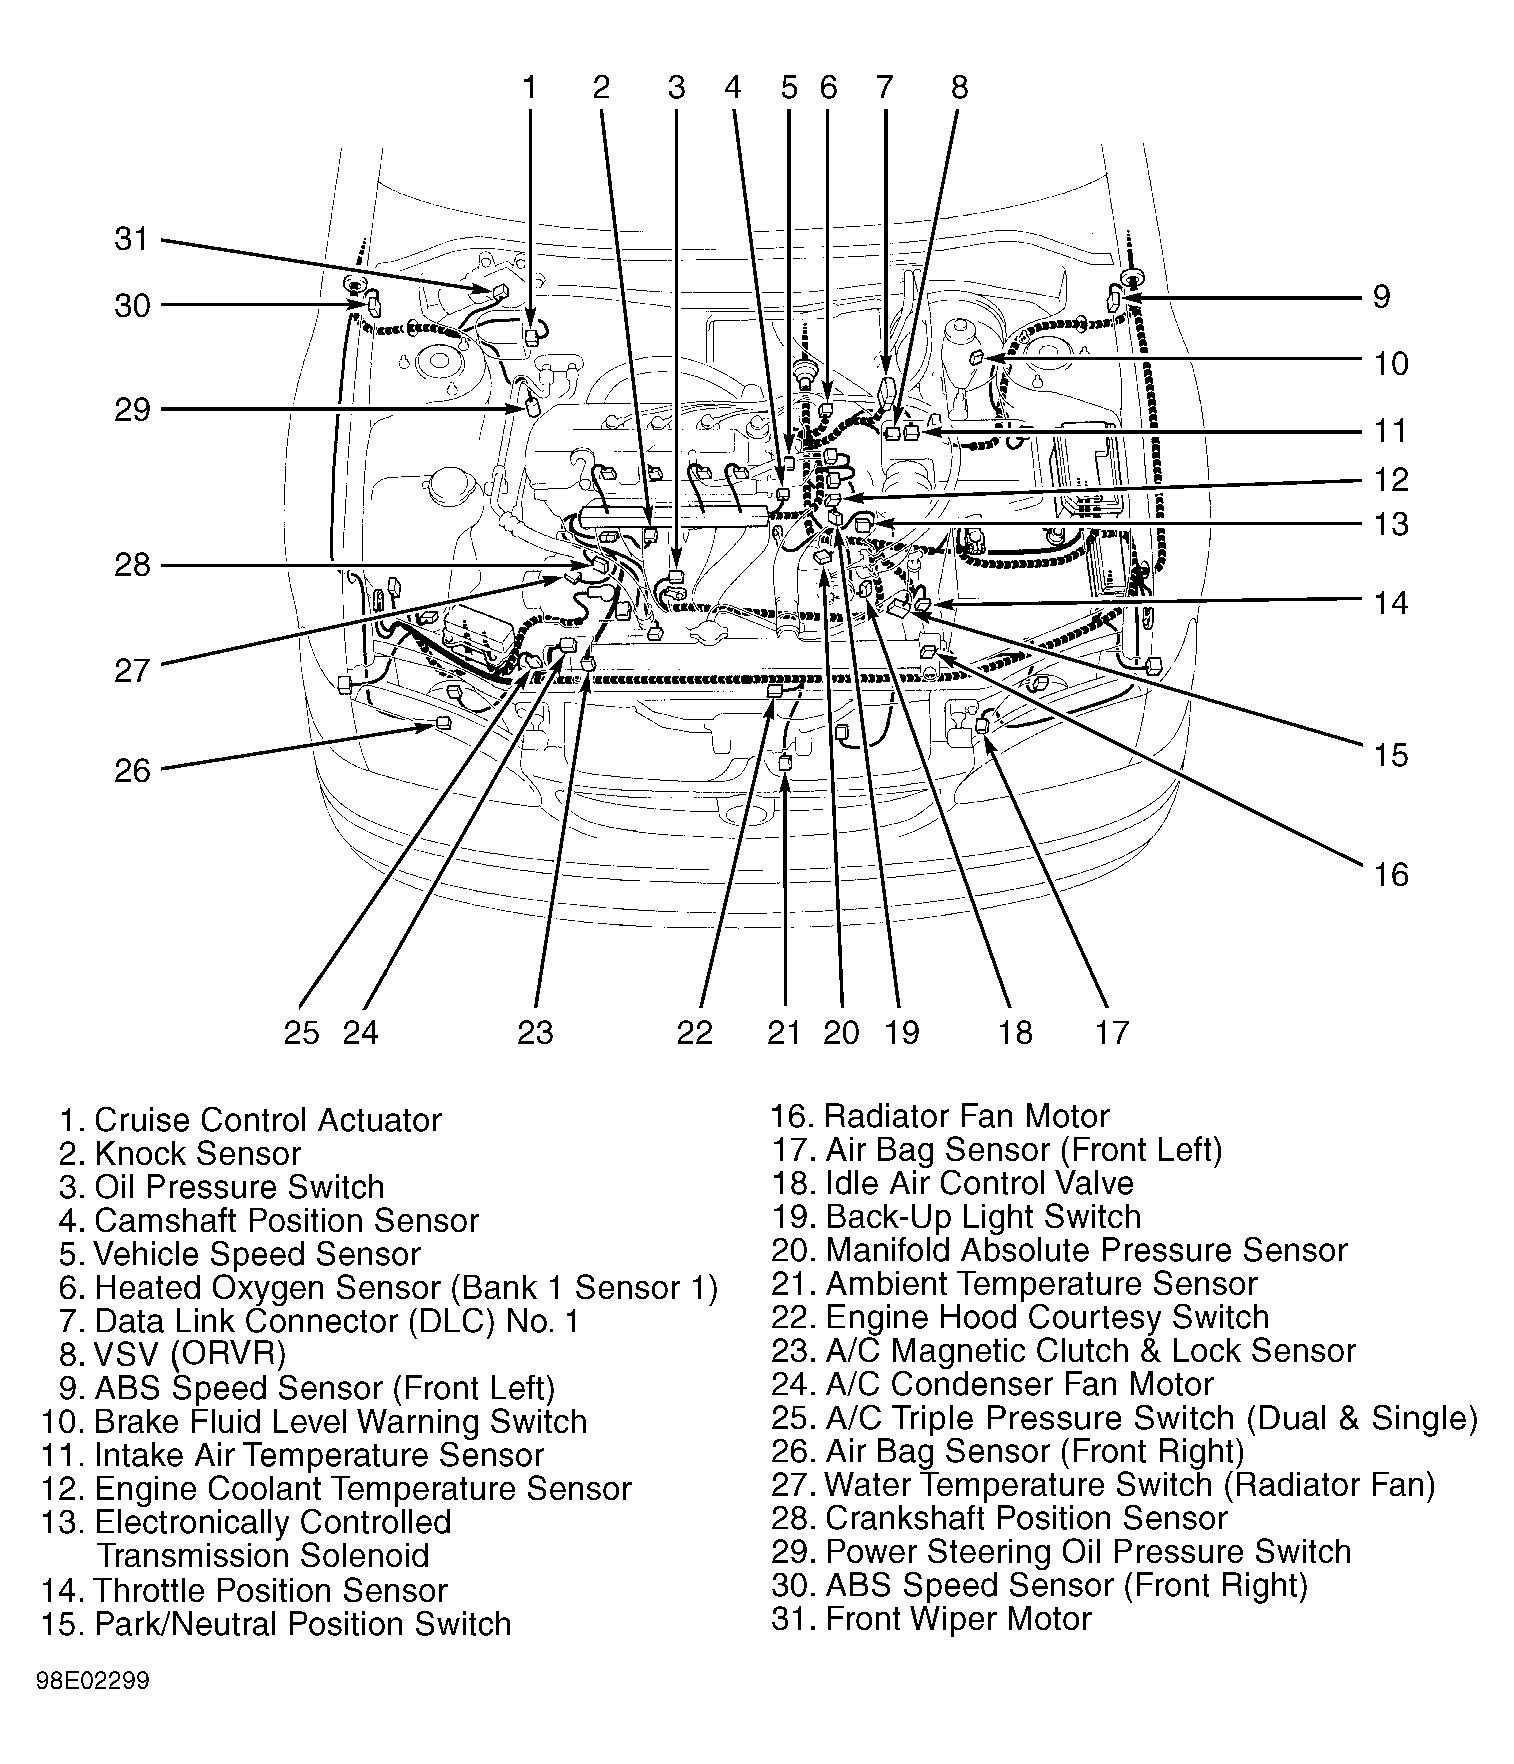 5sfe Wiring Diagram | Wiring Diagram on